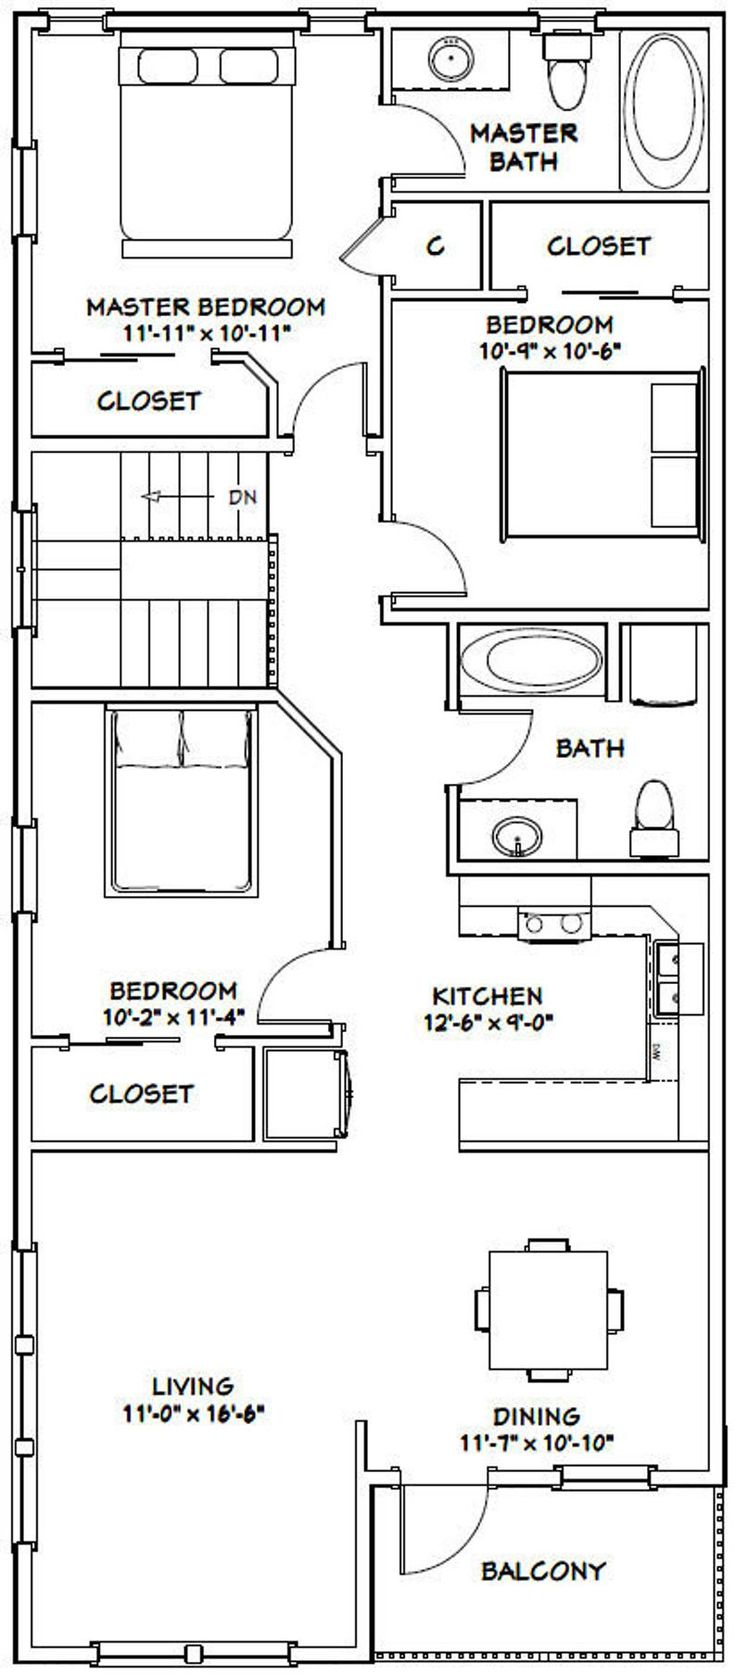 60x50 House 3Bedroom 2.5Bath 1,703 sq ft PDF